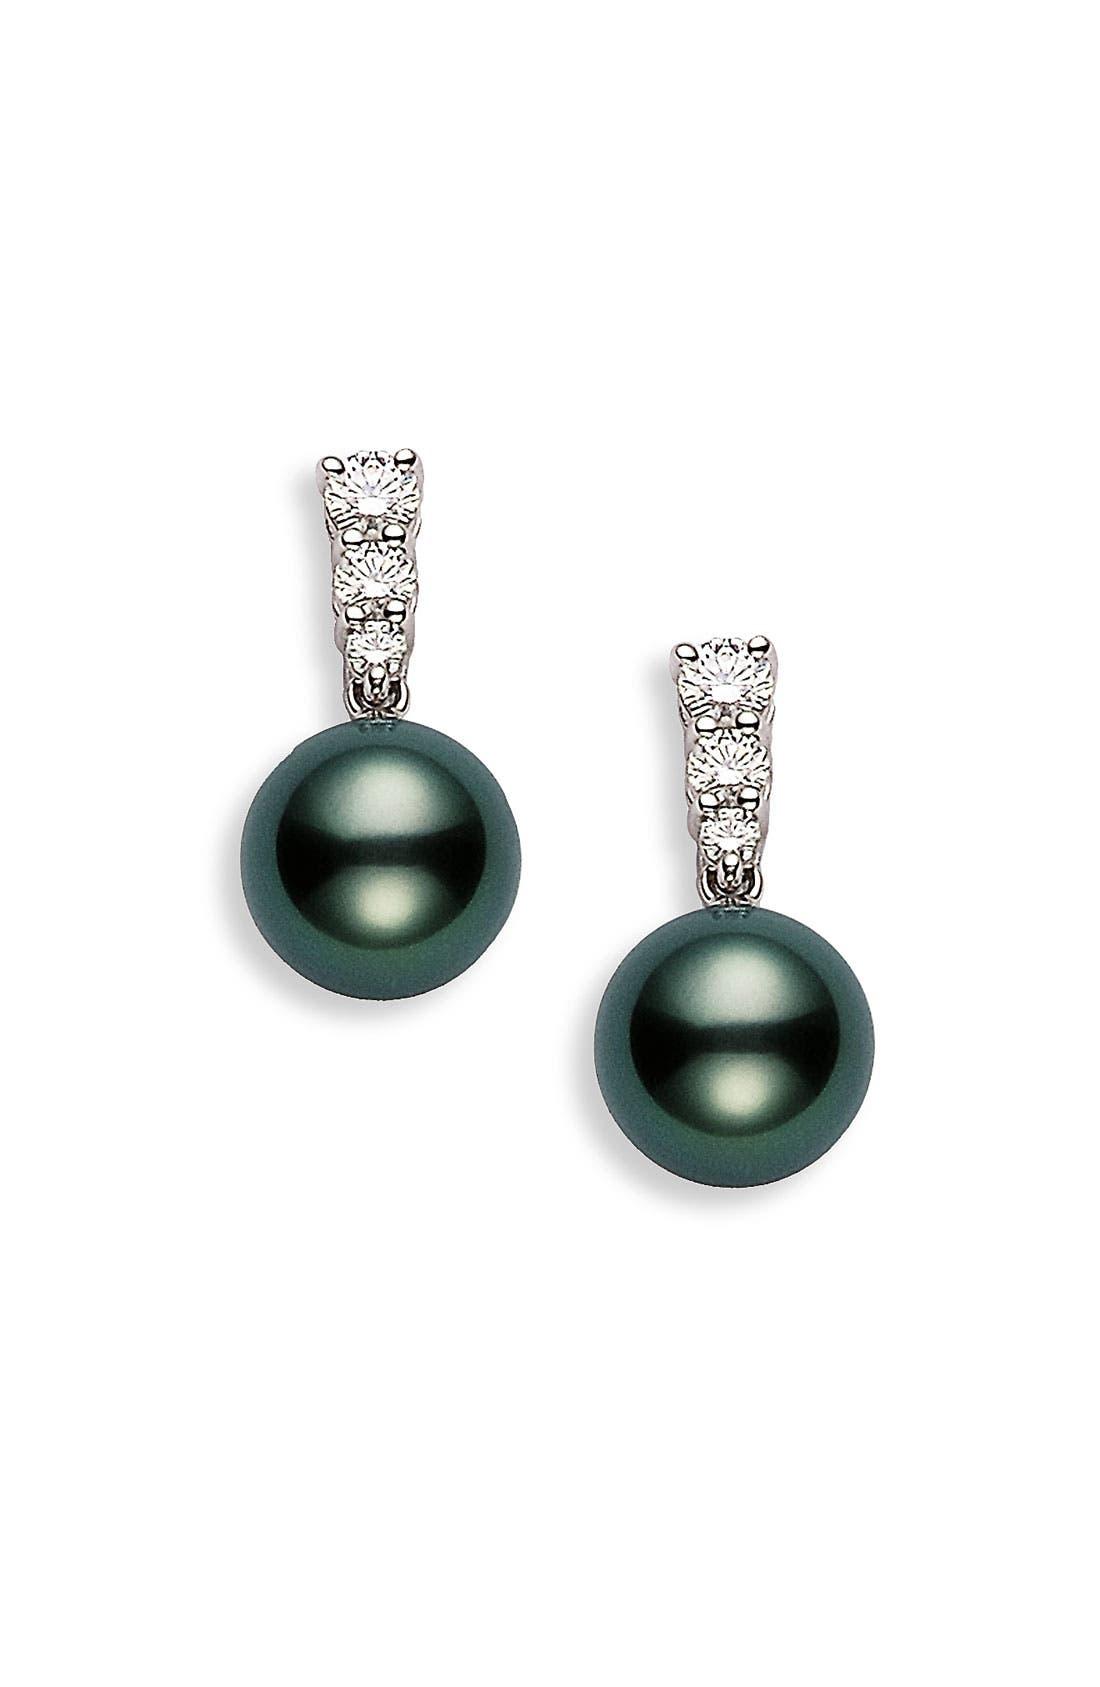 Mikimoto 'Morning Dew' Black South Sea Cultured Pearl & Diamond Earrings